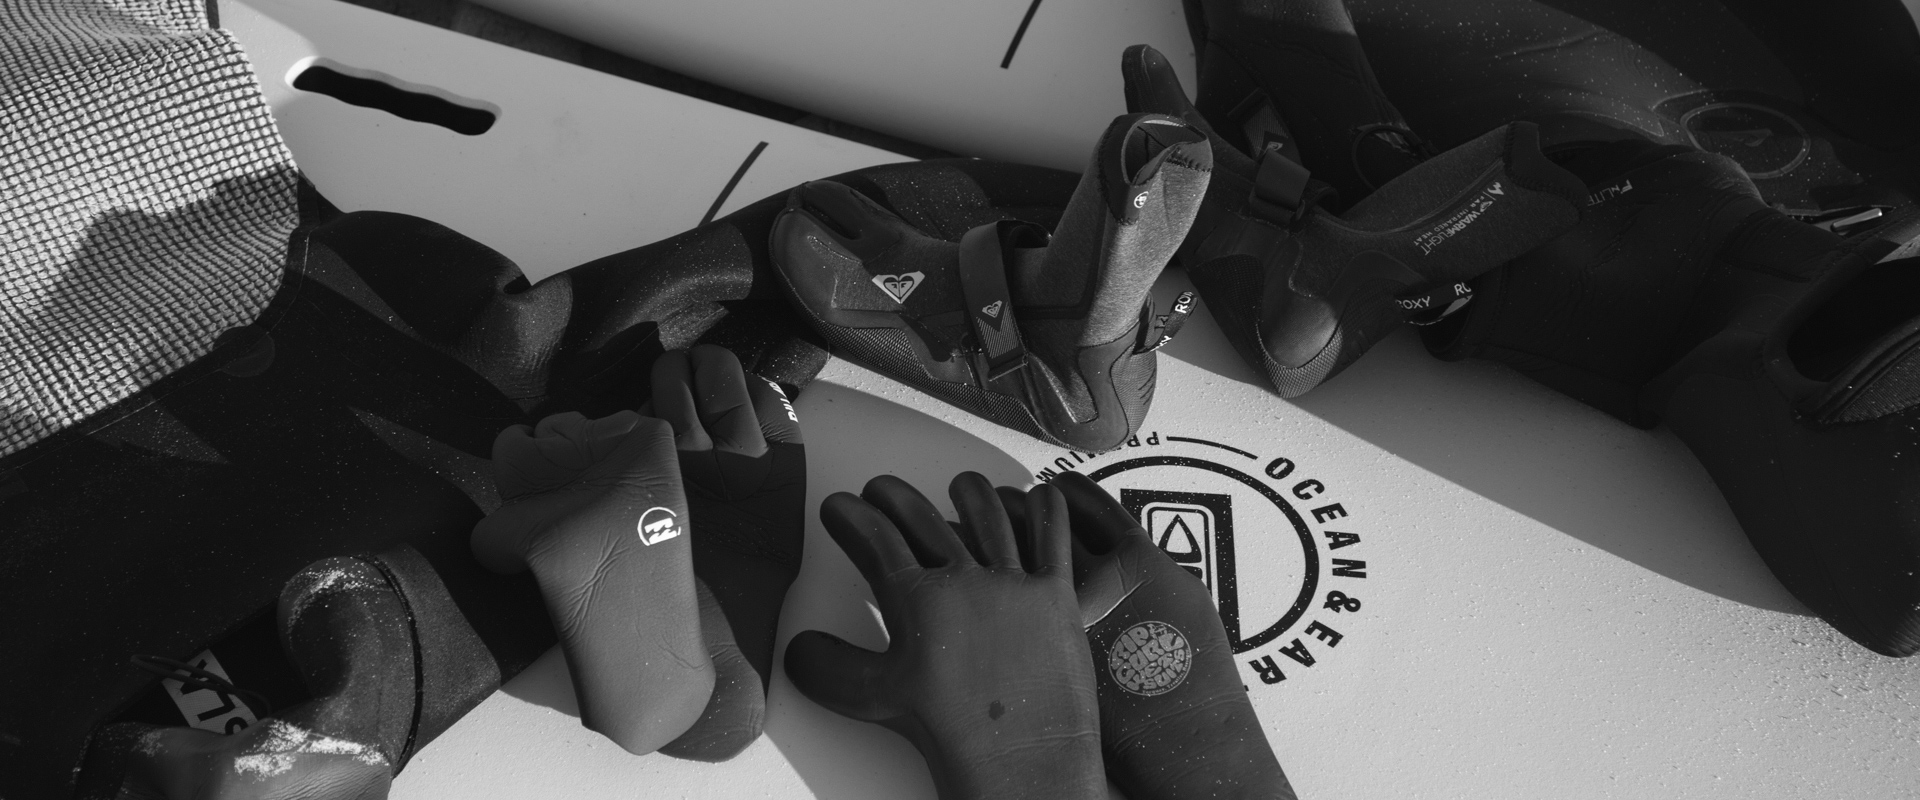 Surf Guides Hossegor - Planches gants leach surf